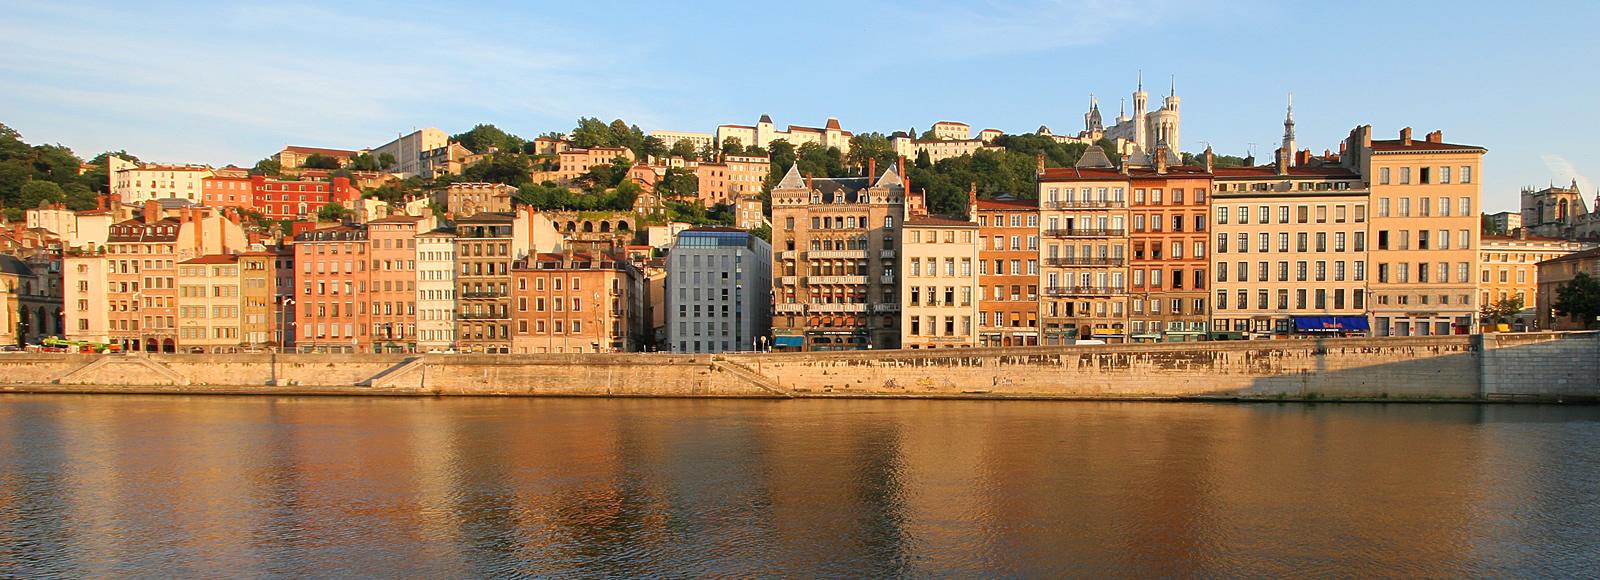 Quai de Saône – Photo: Marie Perrin/Lyon Tourism and Conventions